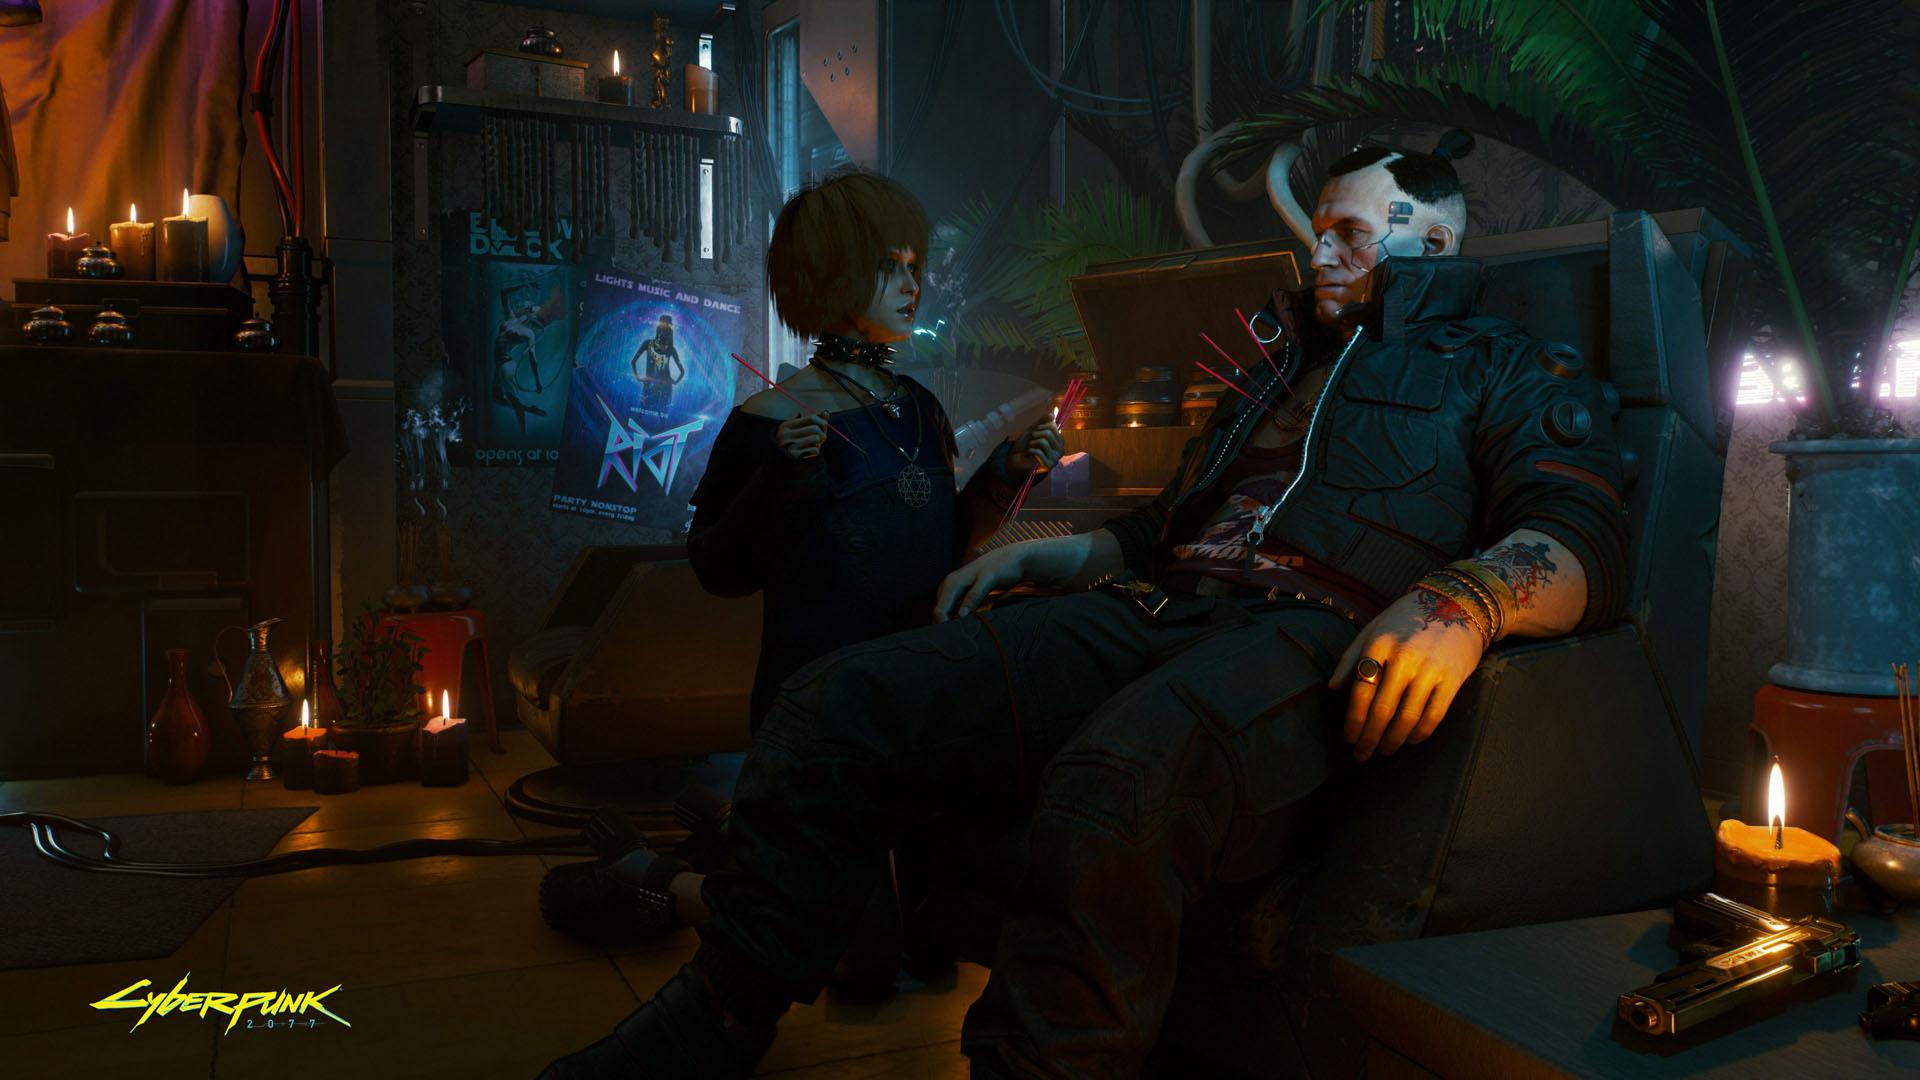 'Cyberpunk 2077' Release Date, E3 Trailer, Gameplay for ...